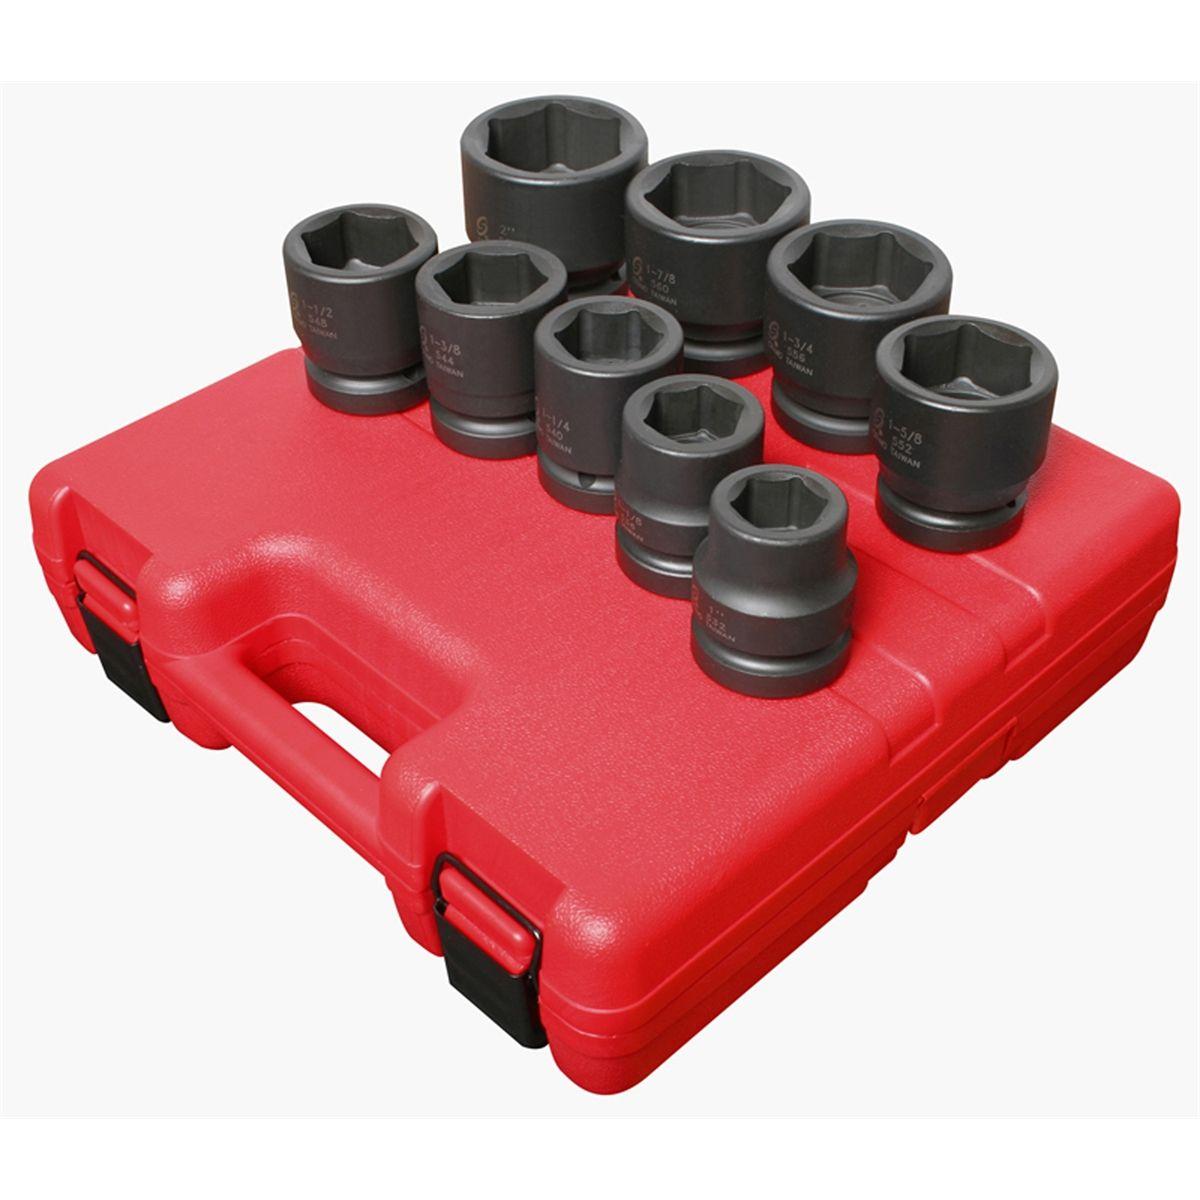 Sunex 5699 9 Piece 1 Drive Standard SAE Jumbo Impact Socket Set